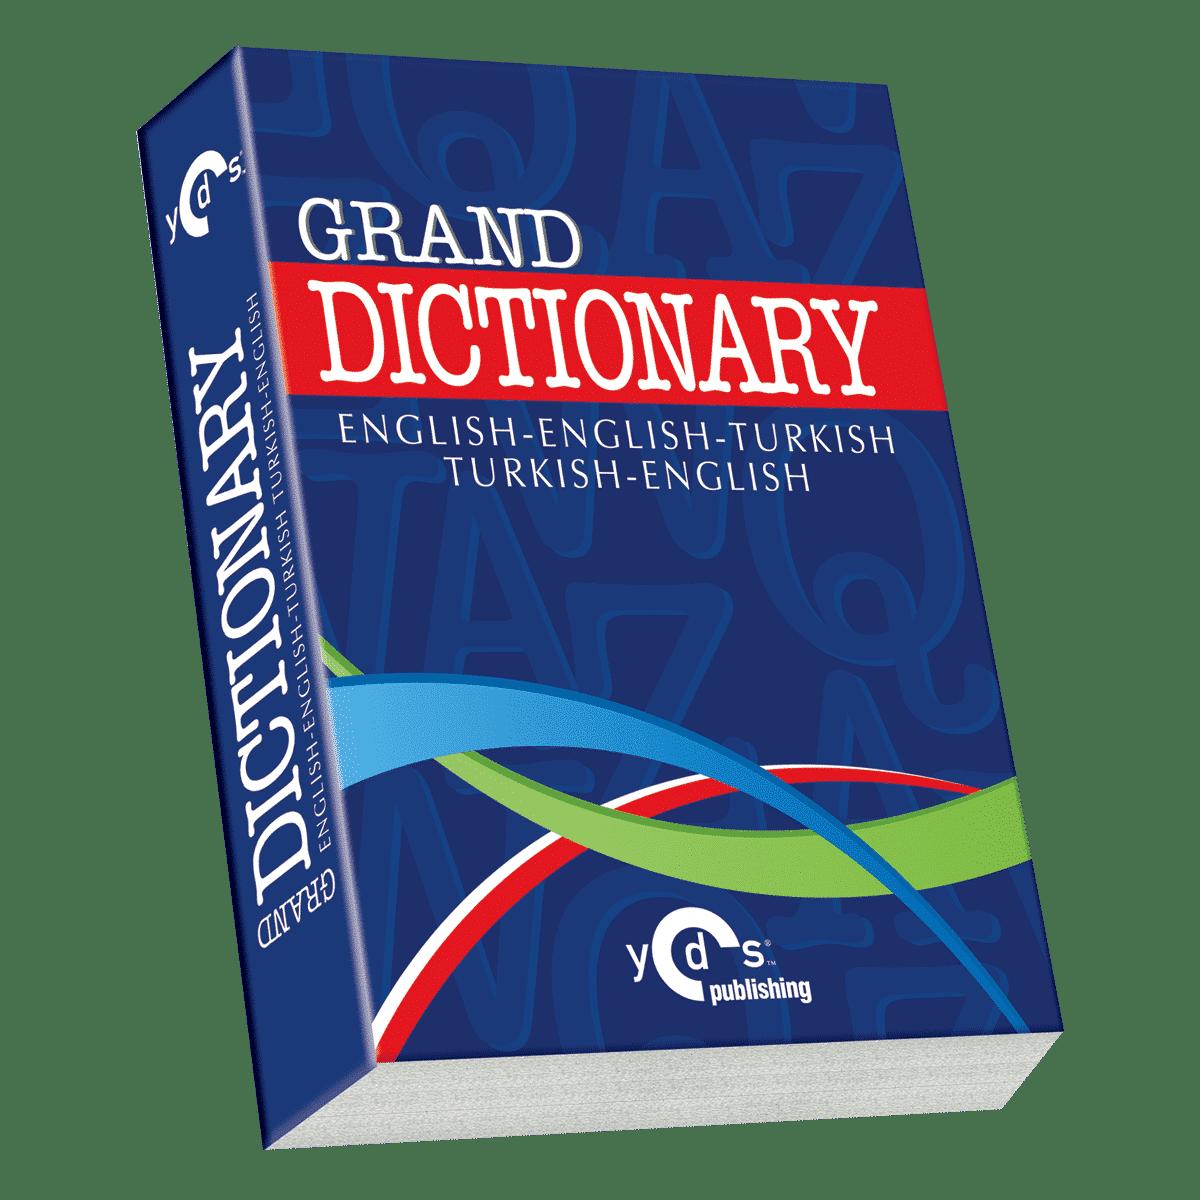 Grand Dictionary grand dictionary -  Grand Dictionary